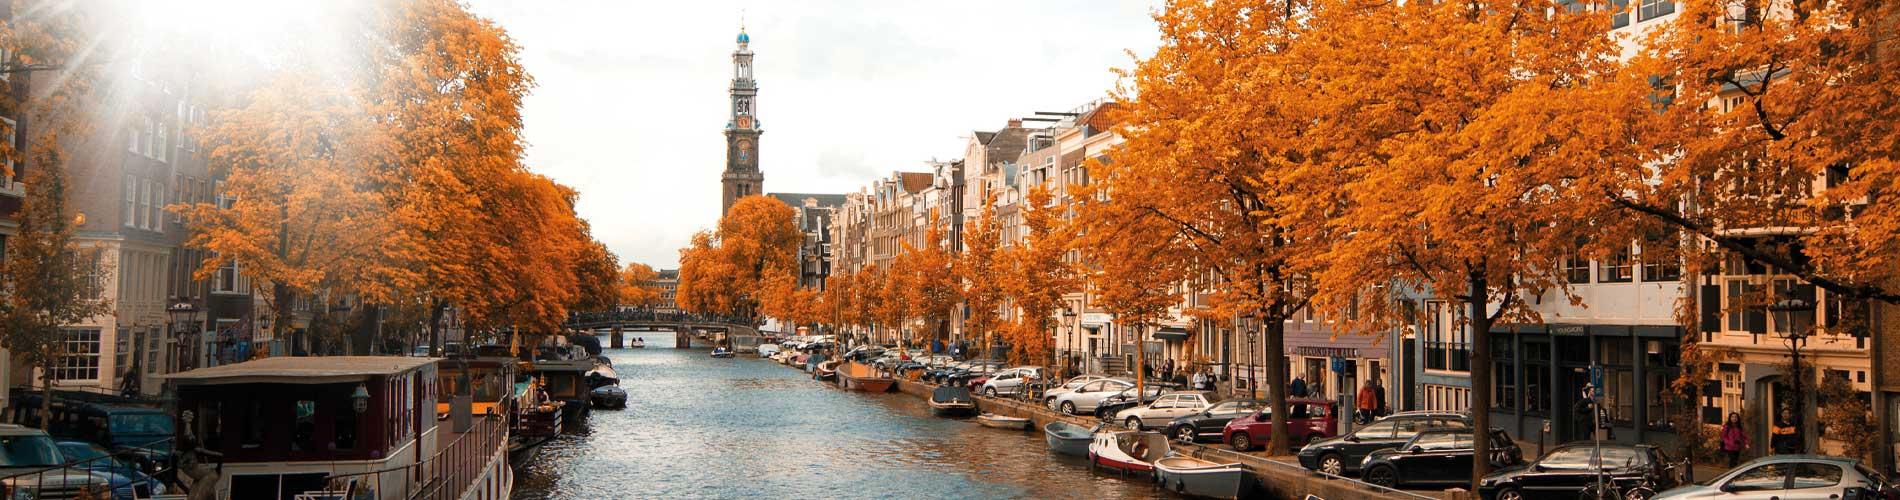 Blog_EarlyBooking_NA_AmsterdamAllSeasons_Autumn_1900x500_Q120